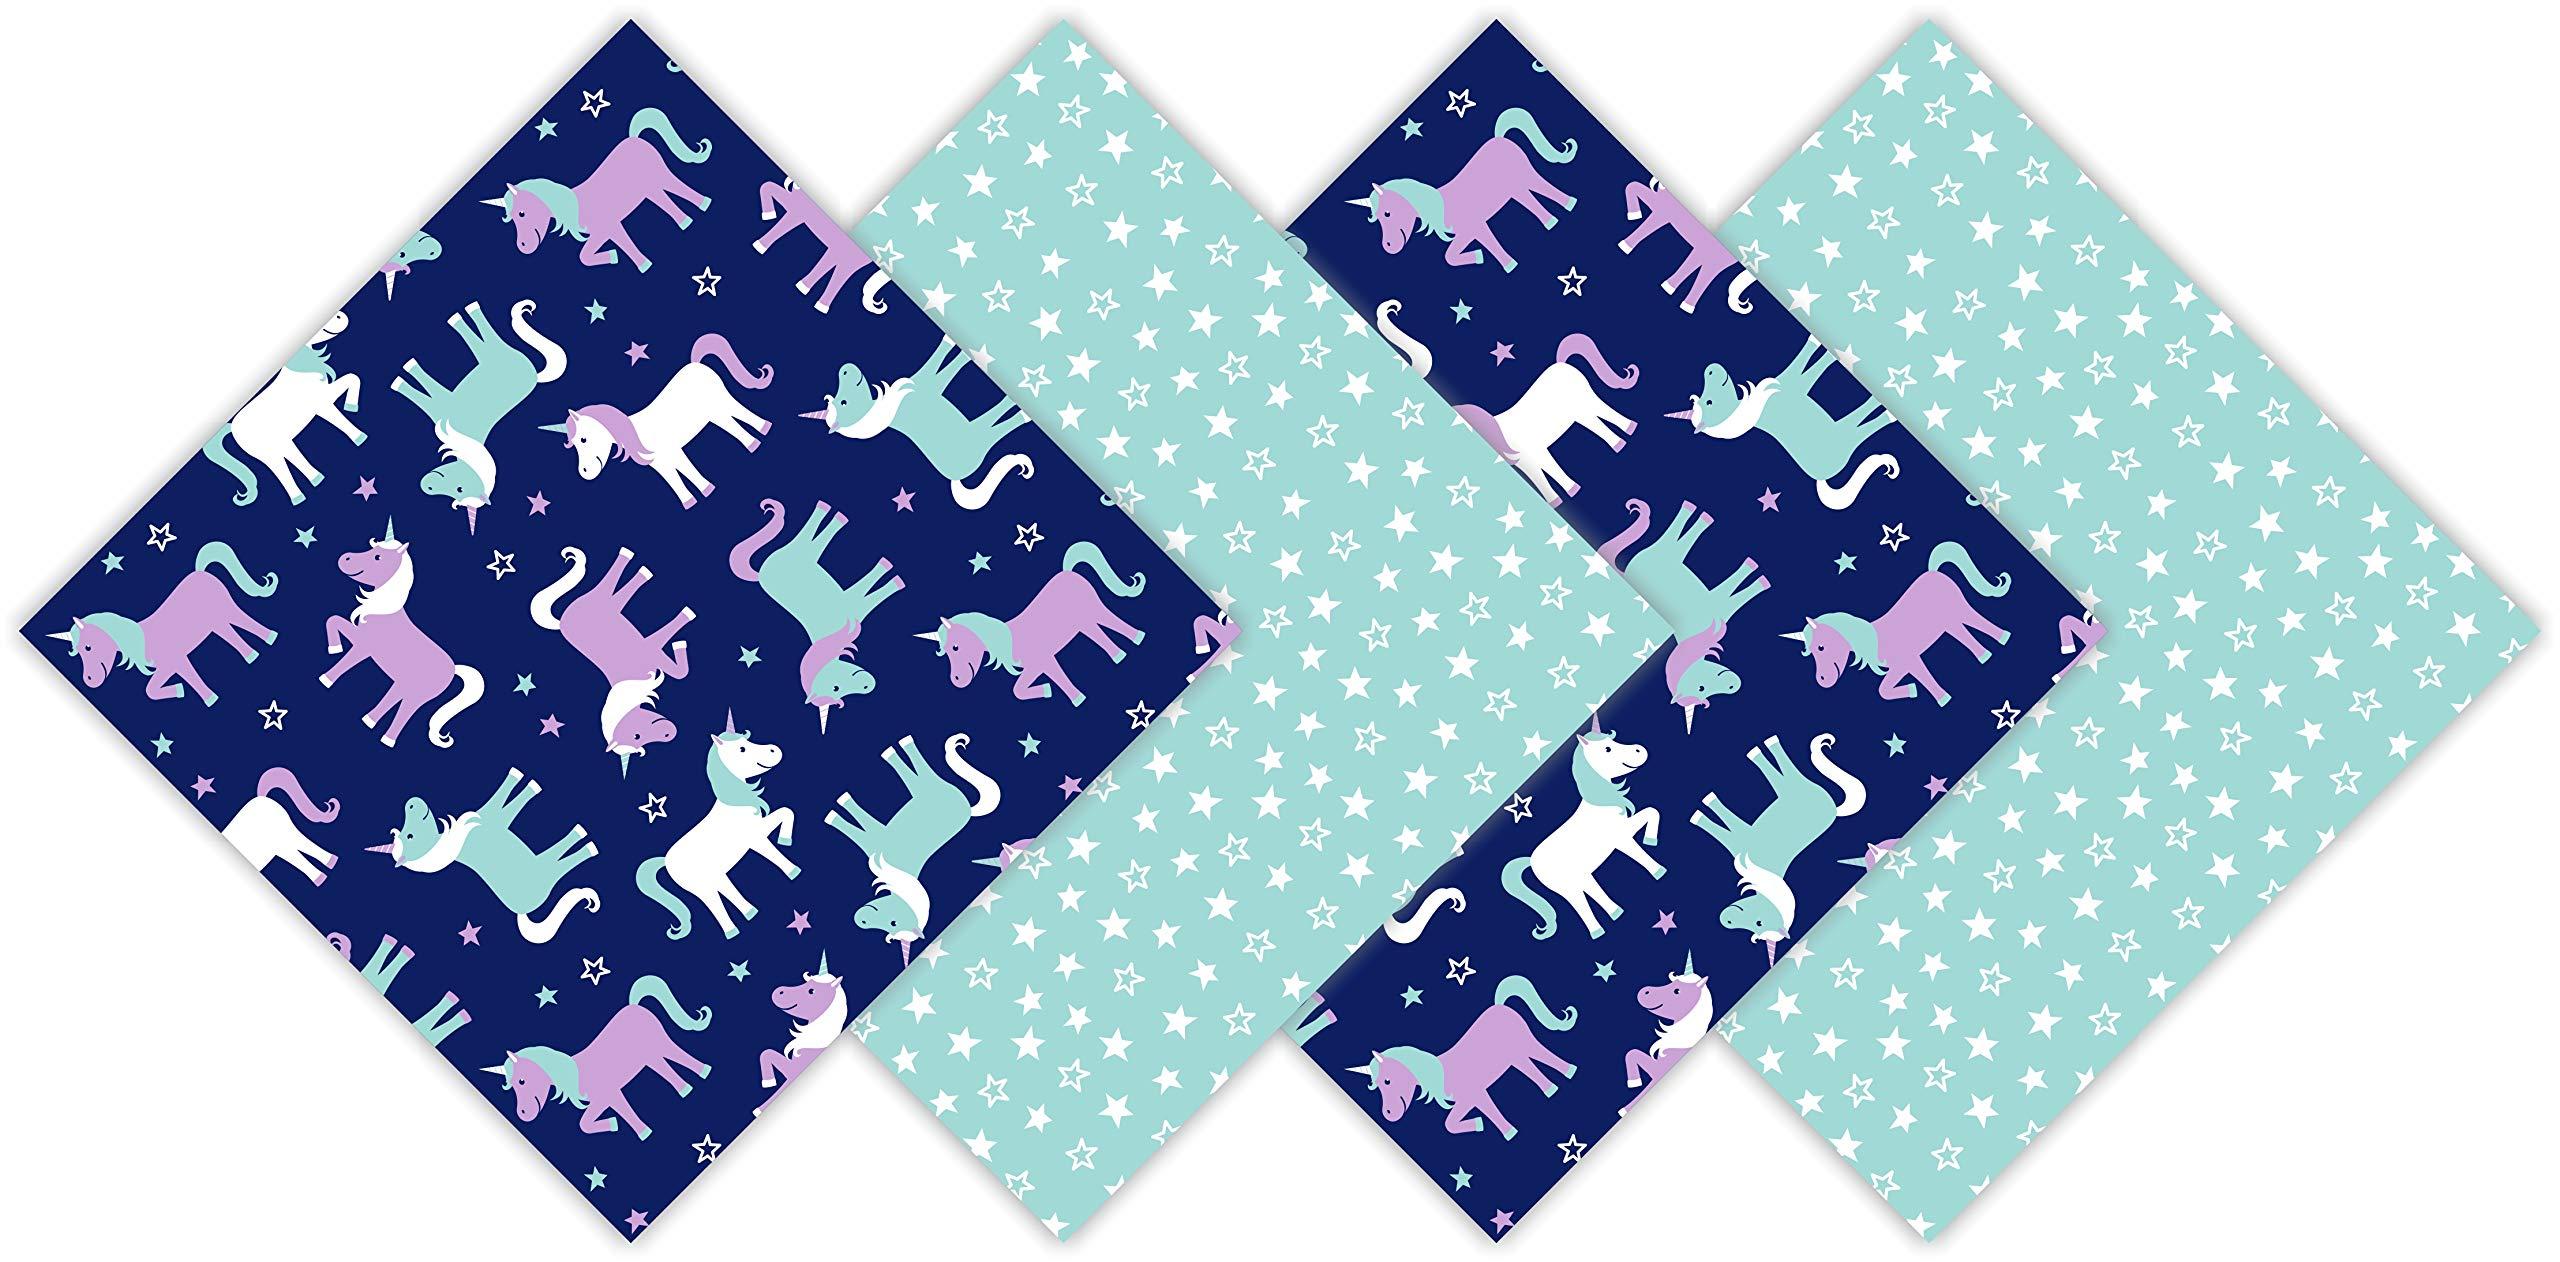 Funkins Reusable Cloth Napkins for Kids | Lunch Boxes | Eco-Friendly | Machine Washable | Name Tag | Set of 4, 12''x12'' Soft Cotton Napkins | Magical Unicorns